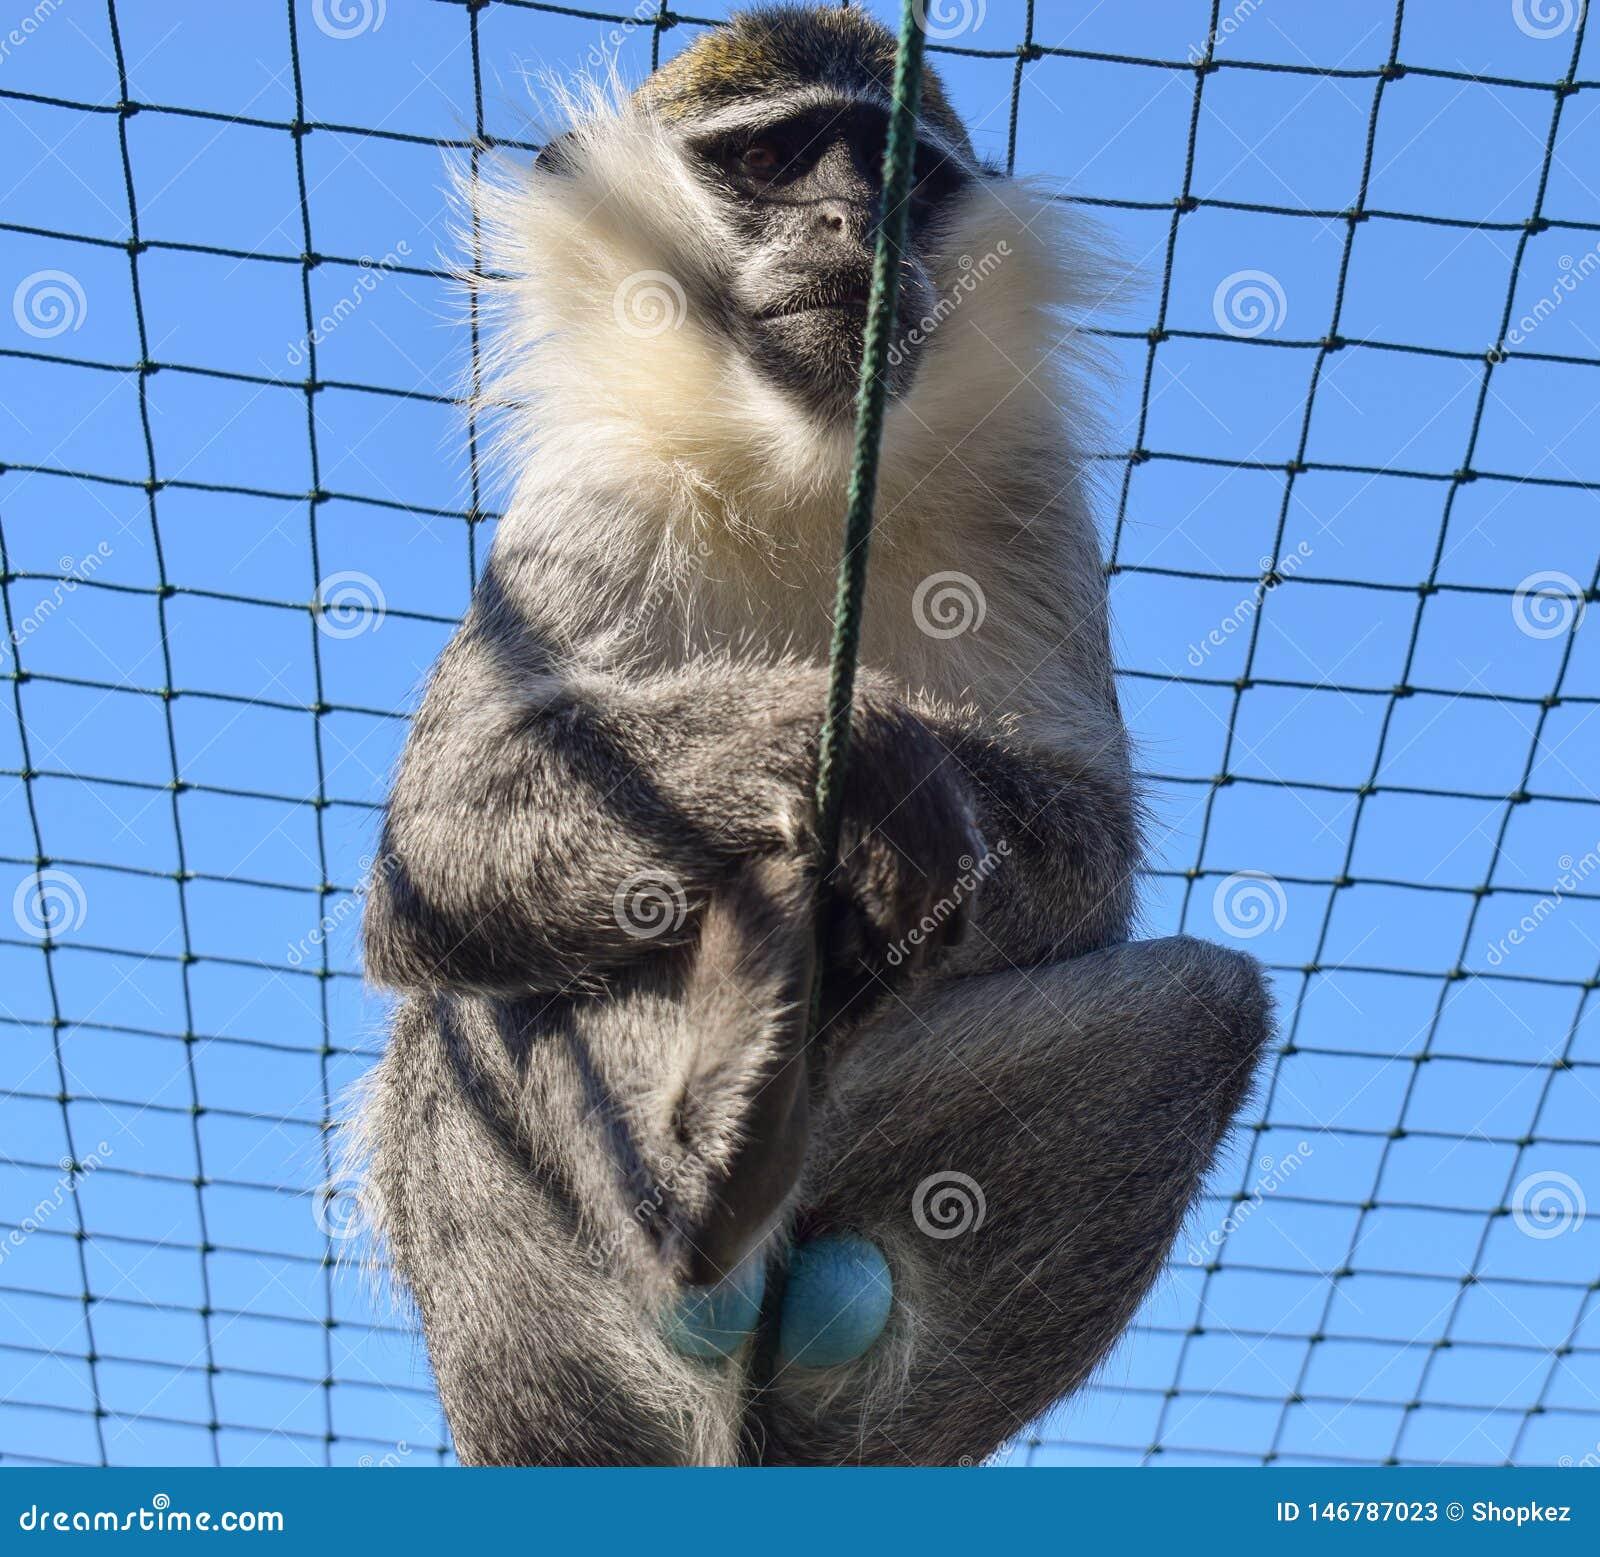 Голубая обезьяна Balled Vervet Обезьяна с голубыми тестикулами в плене